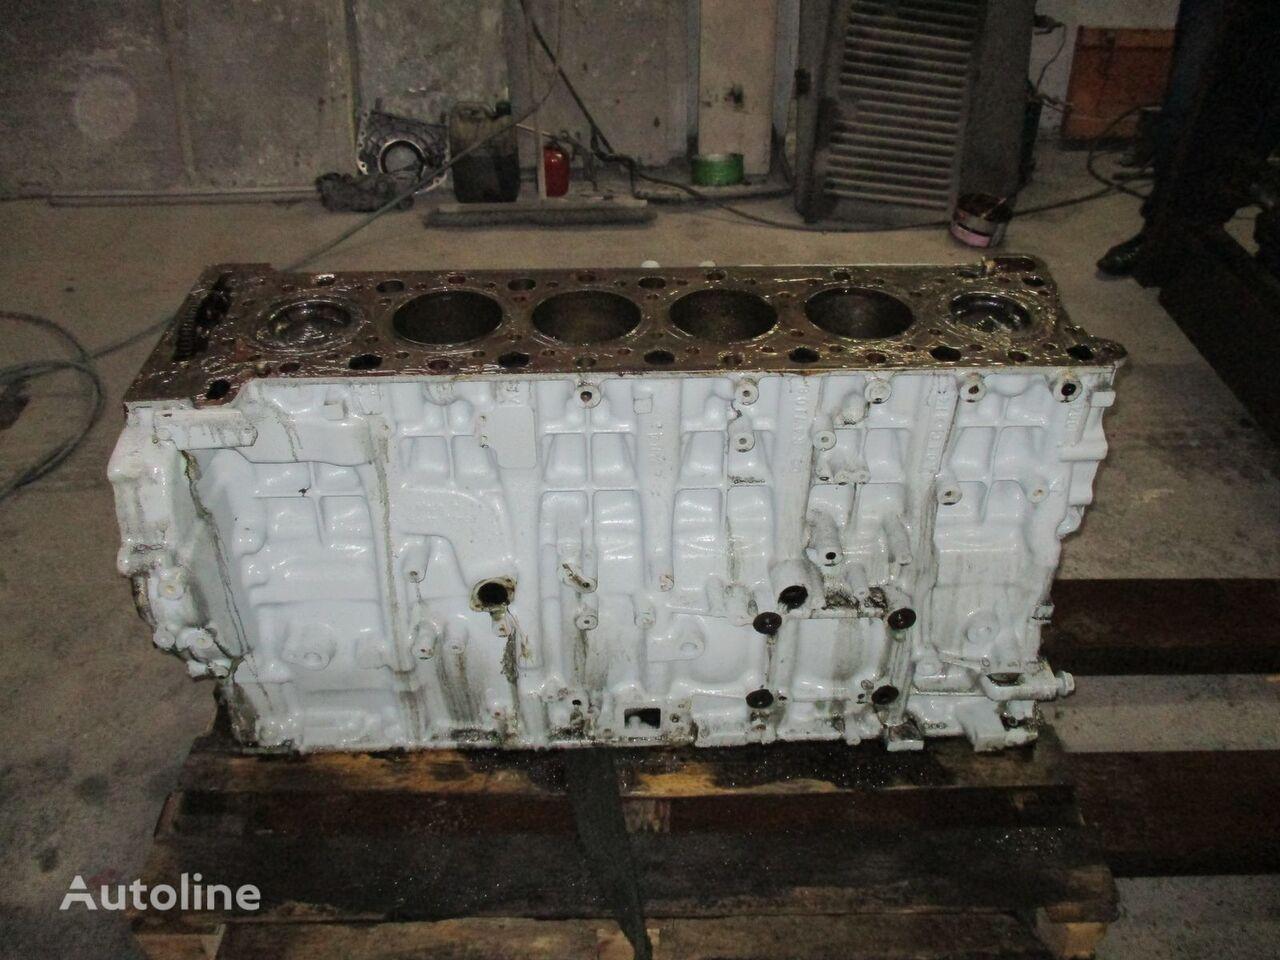 MERCEDES-BENZ , EURO6 cylinder block, 0020106500, OM470LA, OM471LA bloco do motor para MERCEDES-BENZ Actros MP4 camião tractor